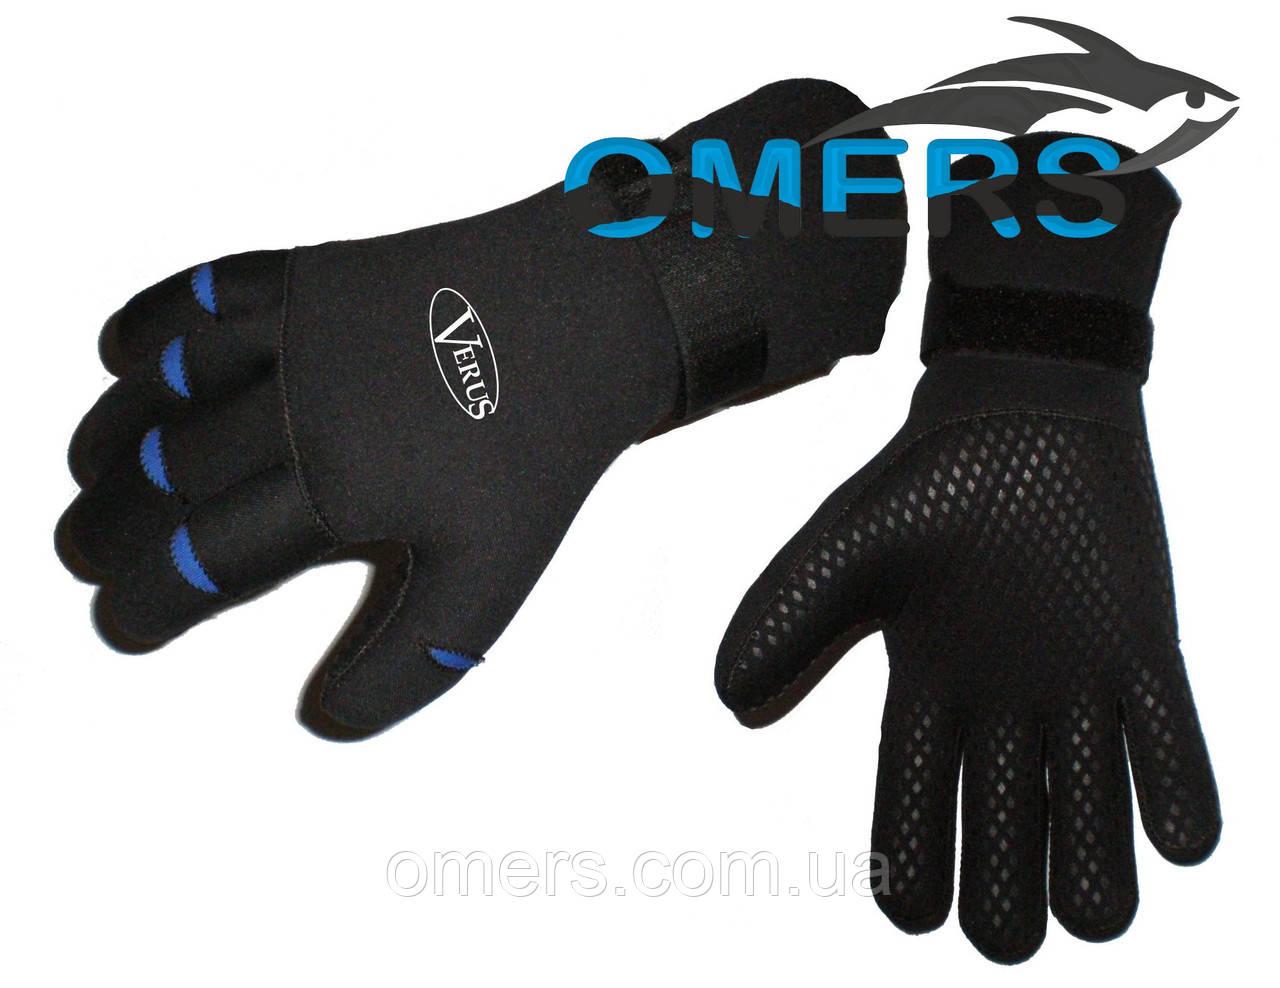 Перчатки Verus с фиксатором на манжете 3мм